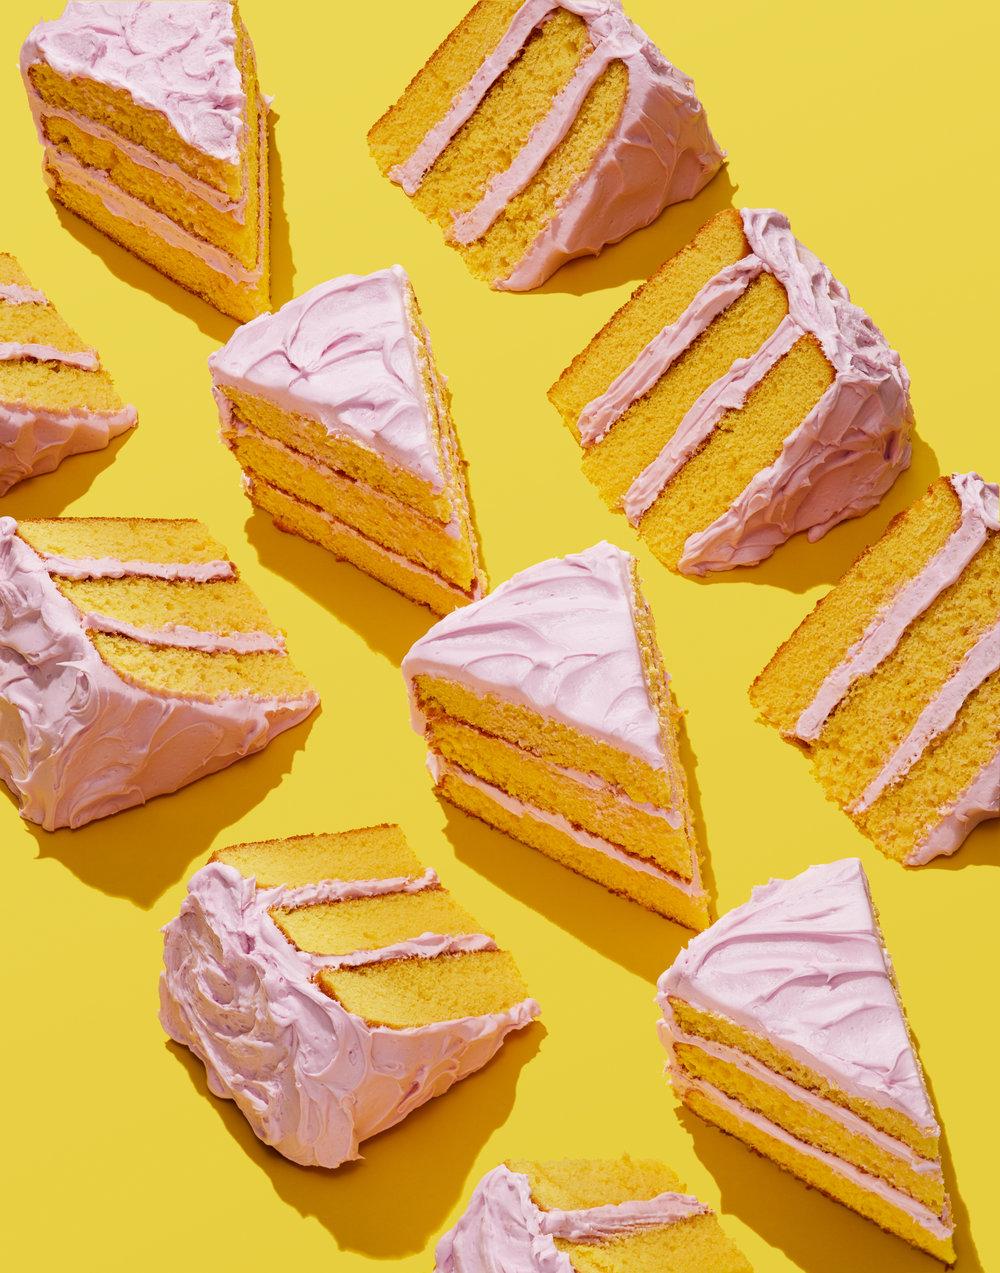 170329 Cake.jpg